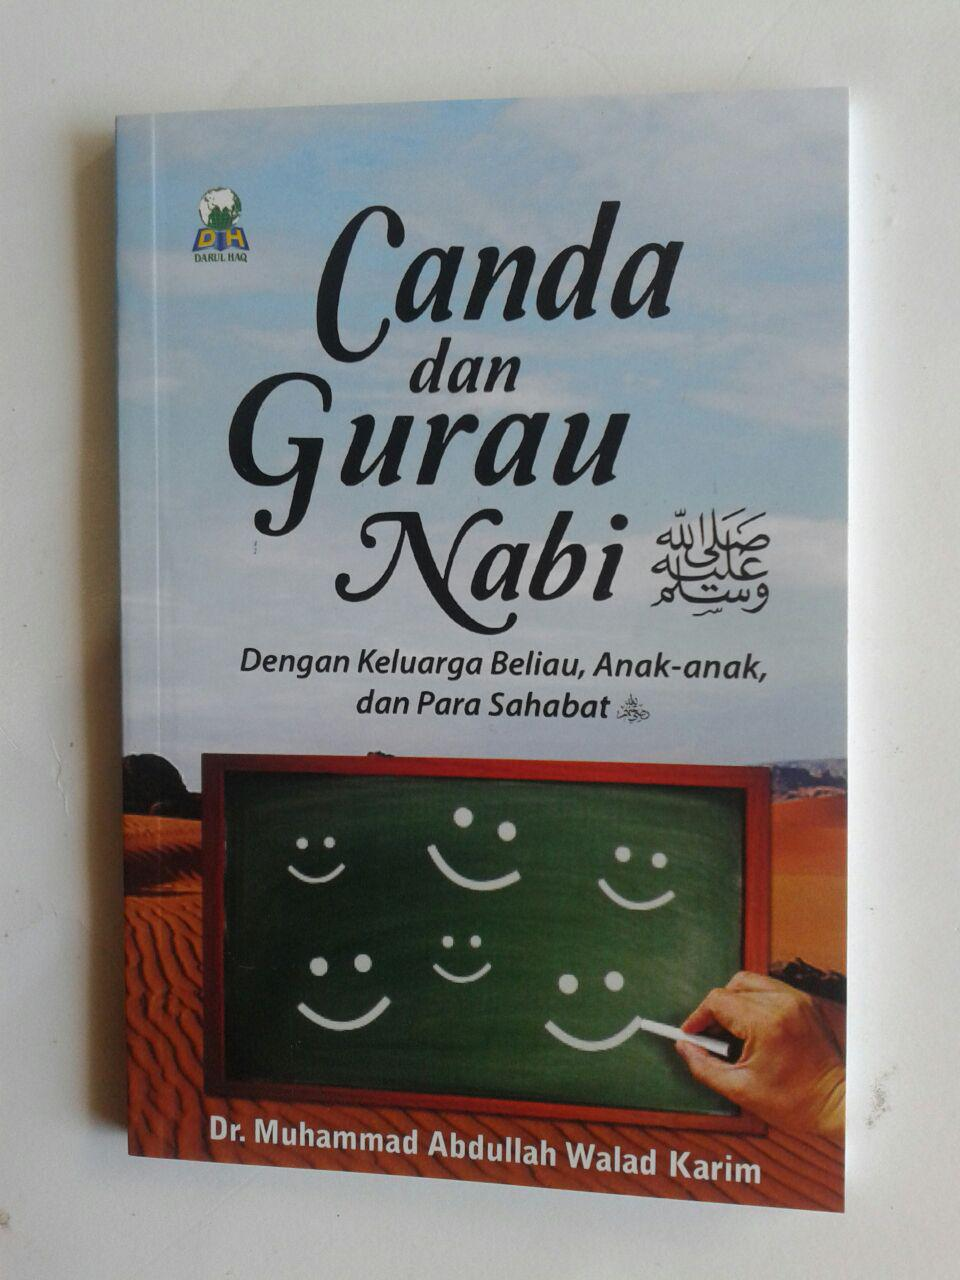 Buku Saku Canda Dan Gurau Nabi 9,000 15% 7,650 cover